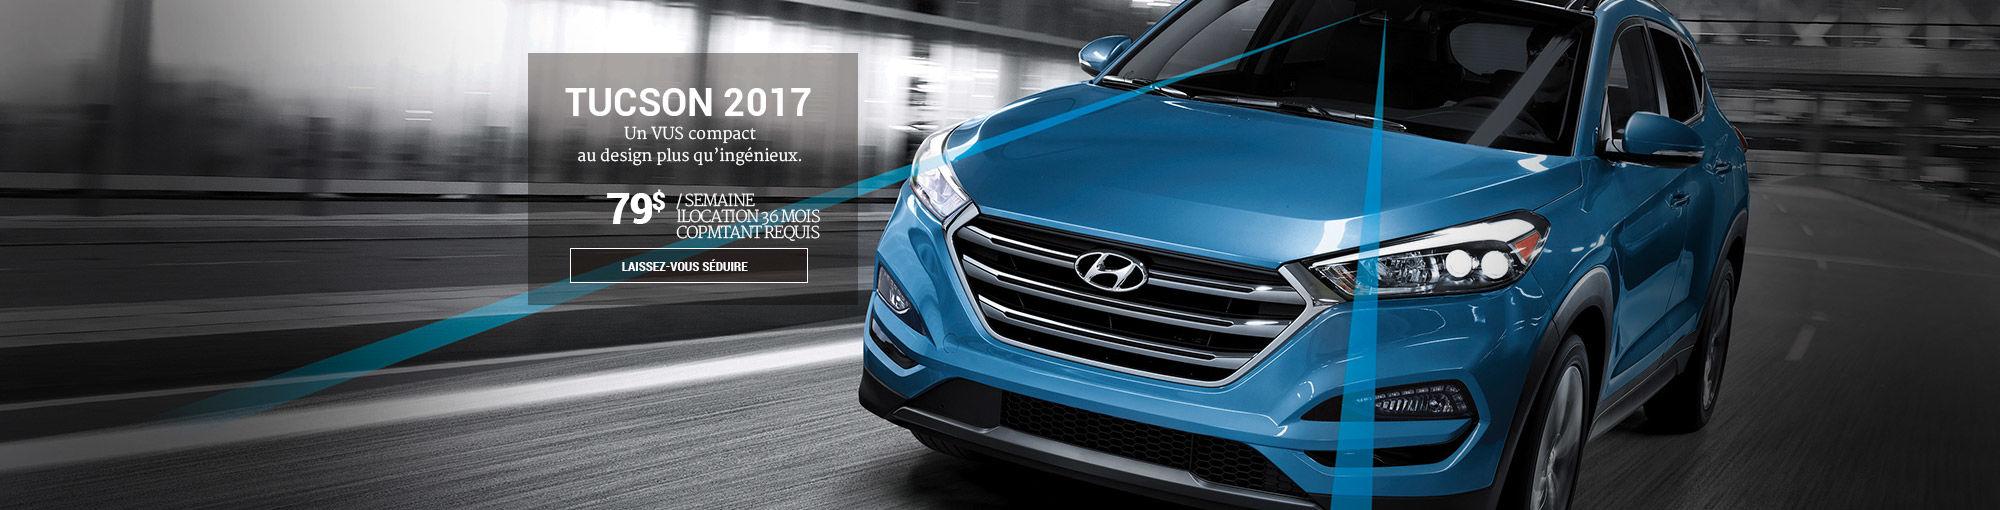 Hyundai Tucson 2017 header - janvier 2017 htr et hsh